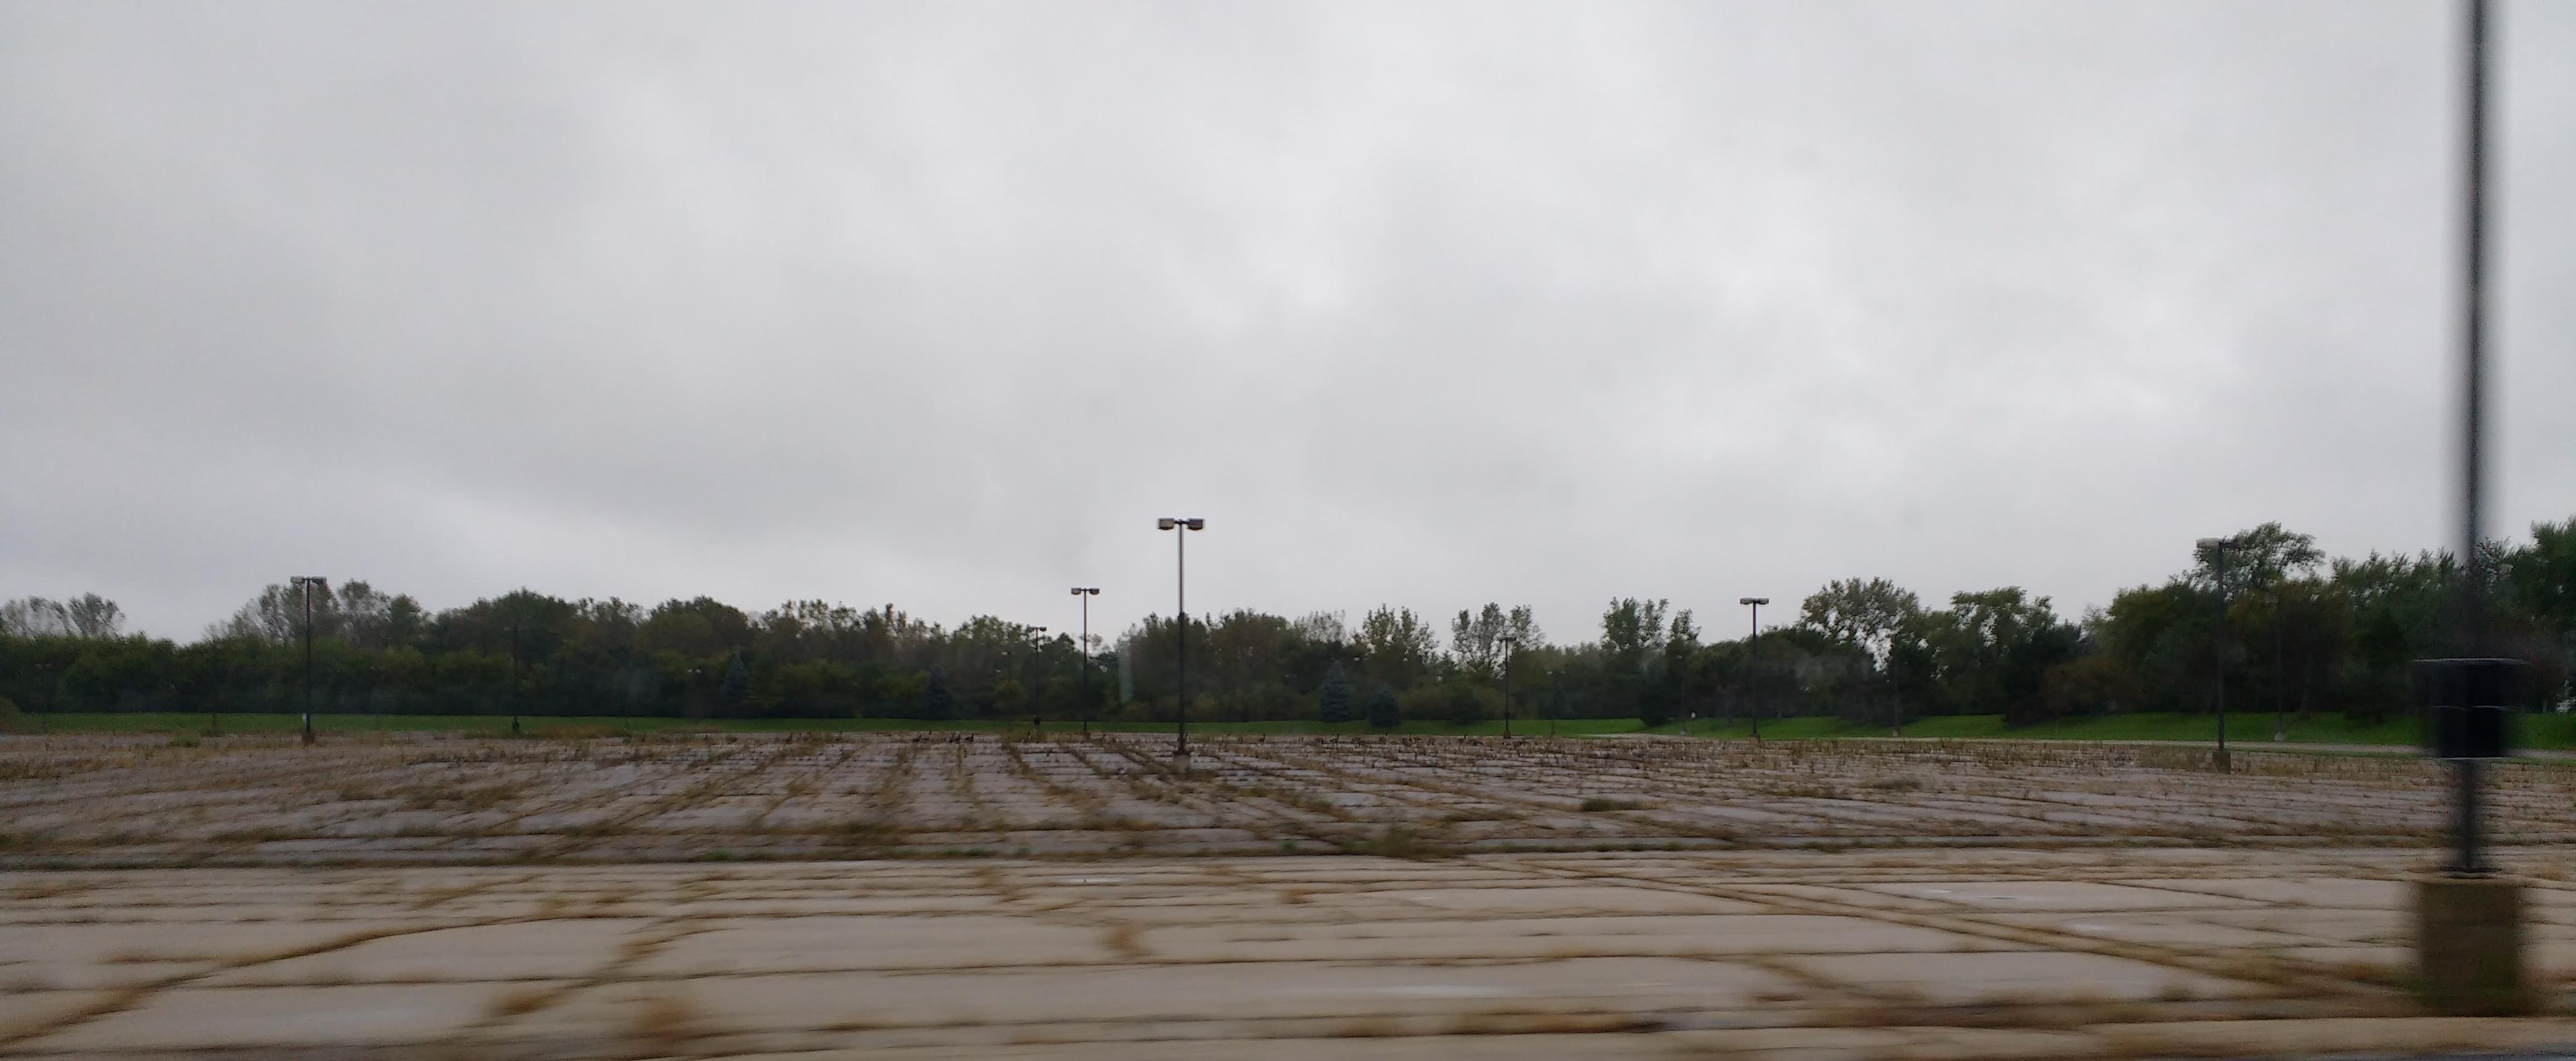 abandonedparkinglot.jpg